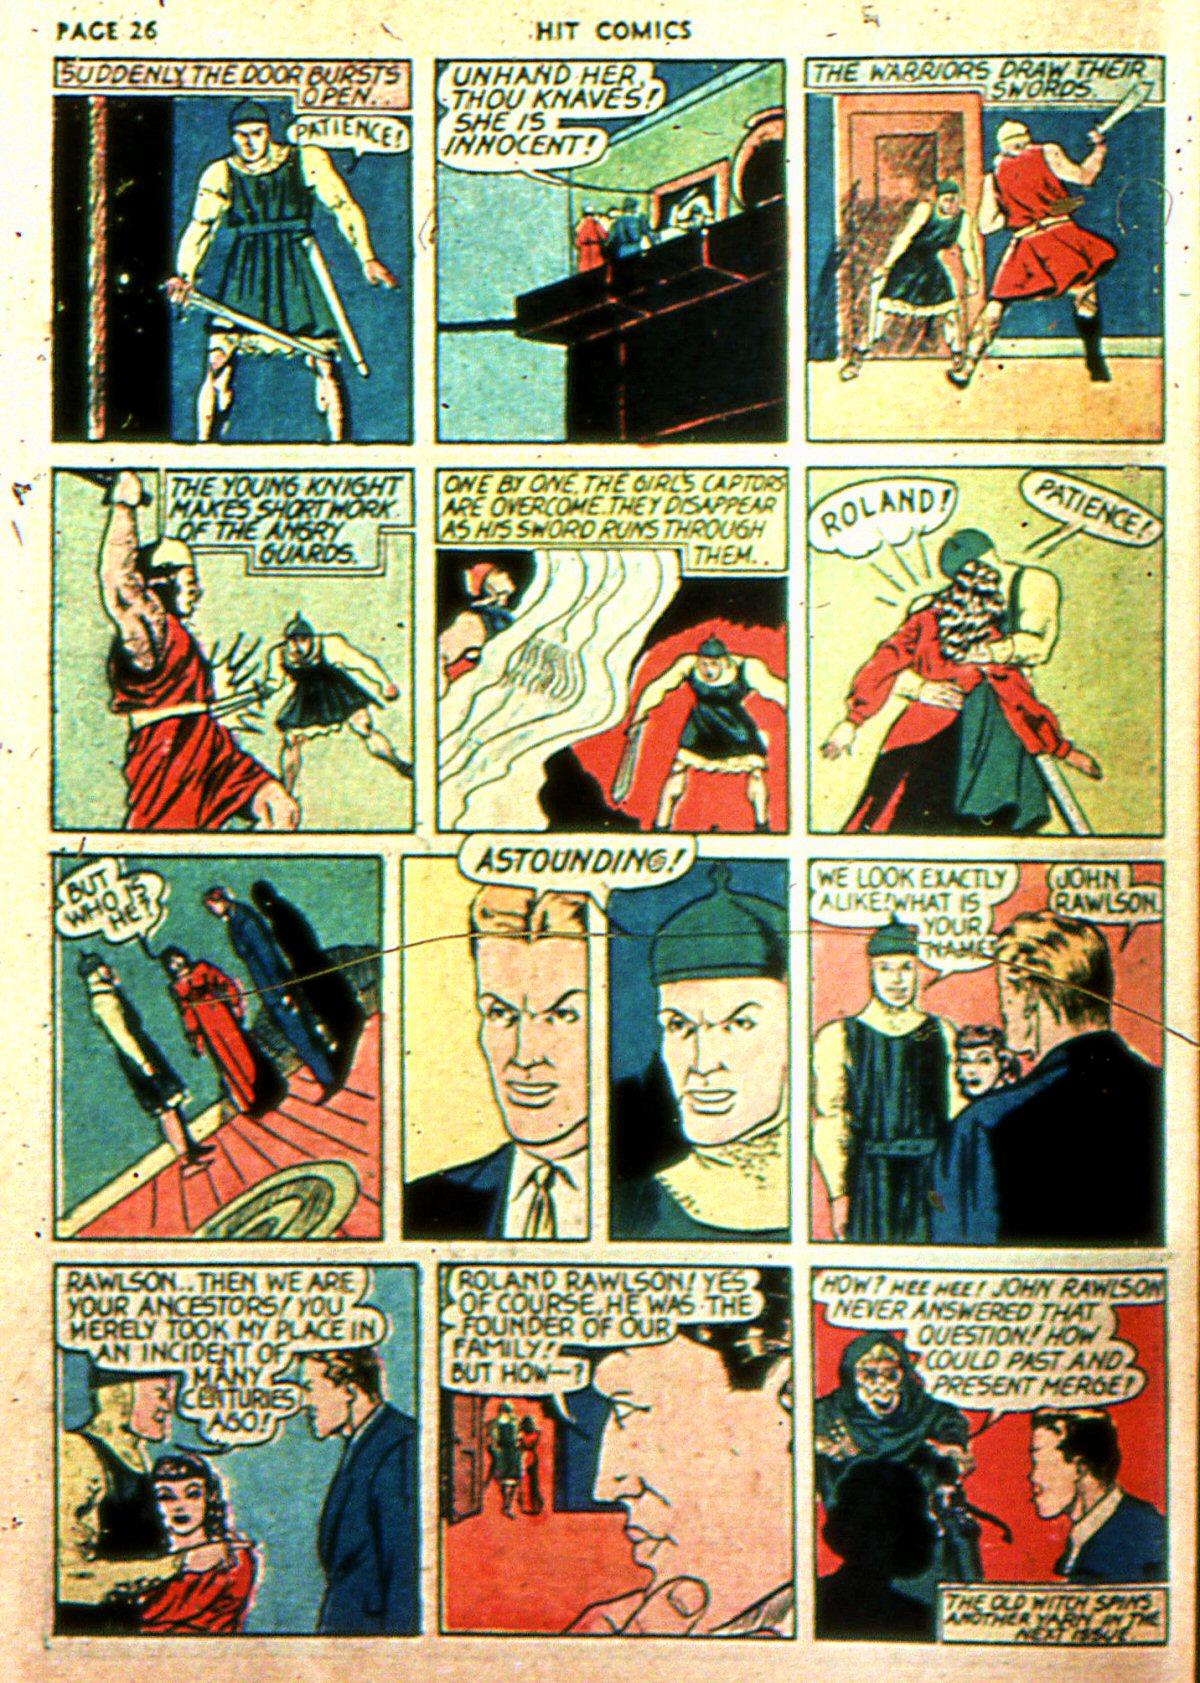 Read online Hit Comics comic -  Issue #2 - 28